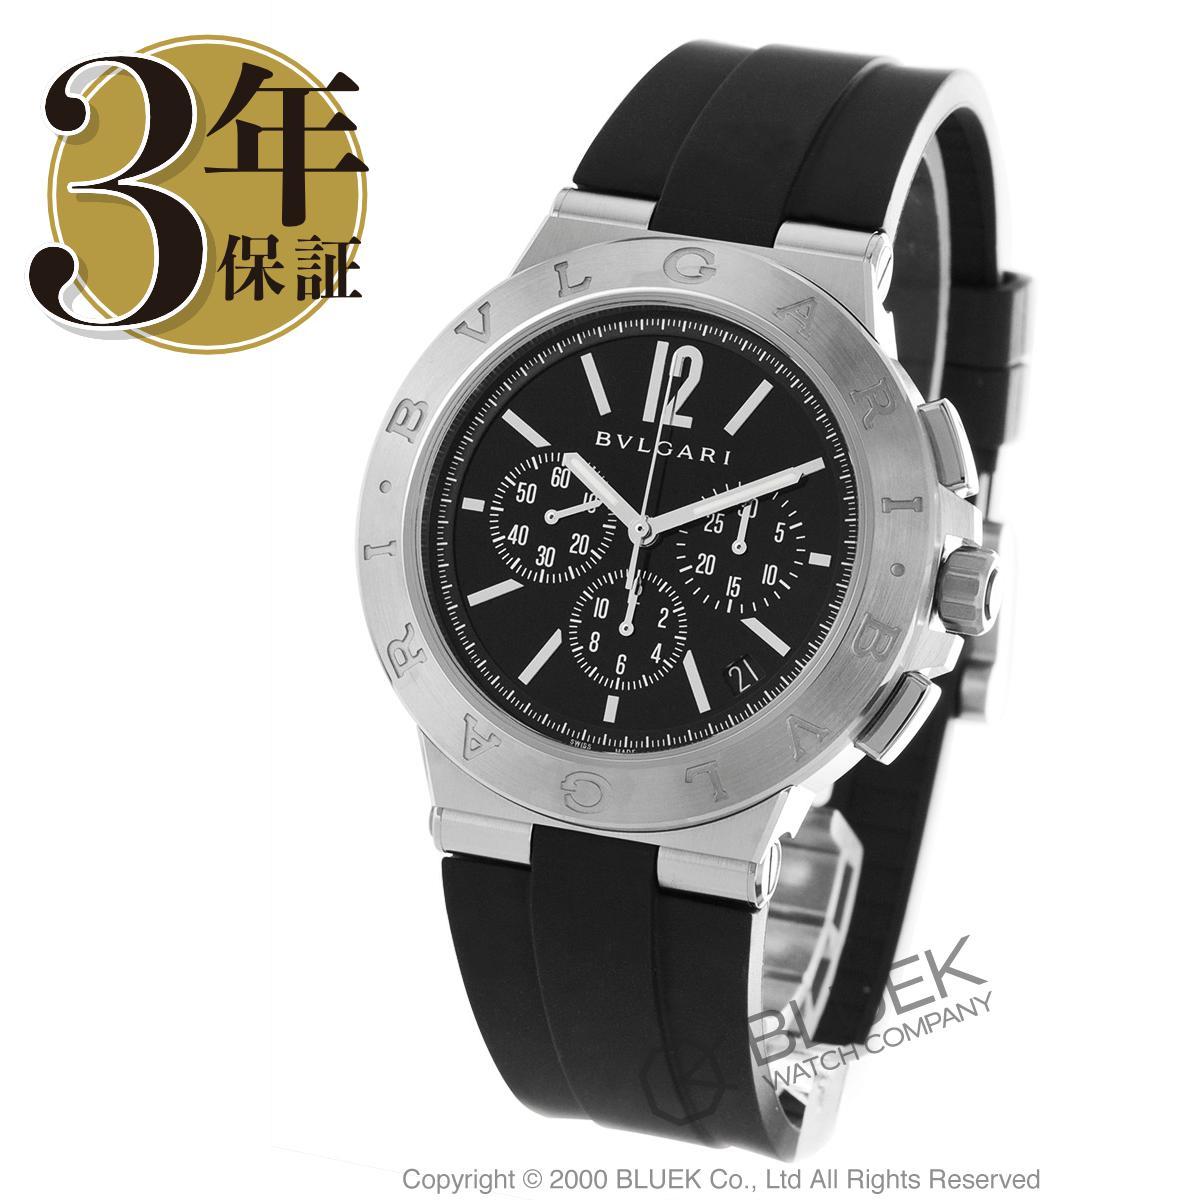 1ca1f1e36a78 ブルガリディアゴノヴェロチッシモクロノグラフ腕時計メンズBVLGARIDG41BSVDCH-SET-BLK ...